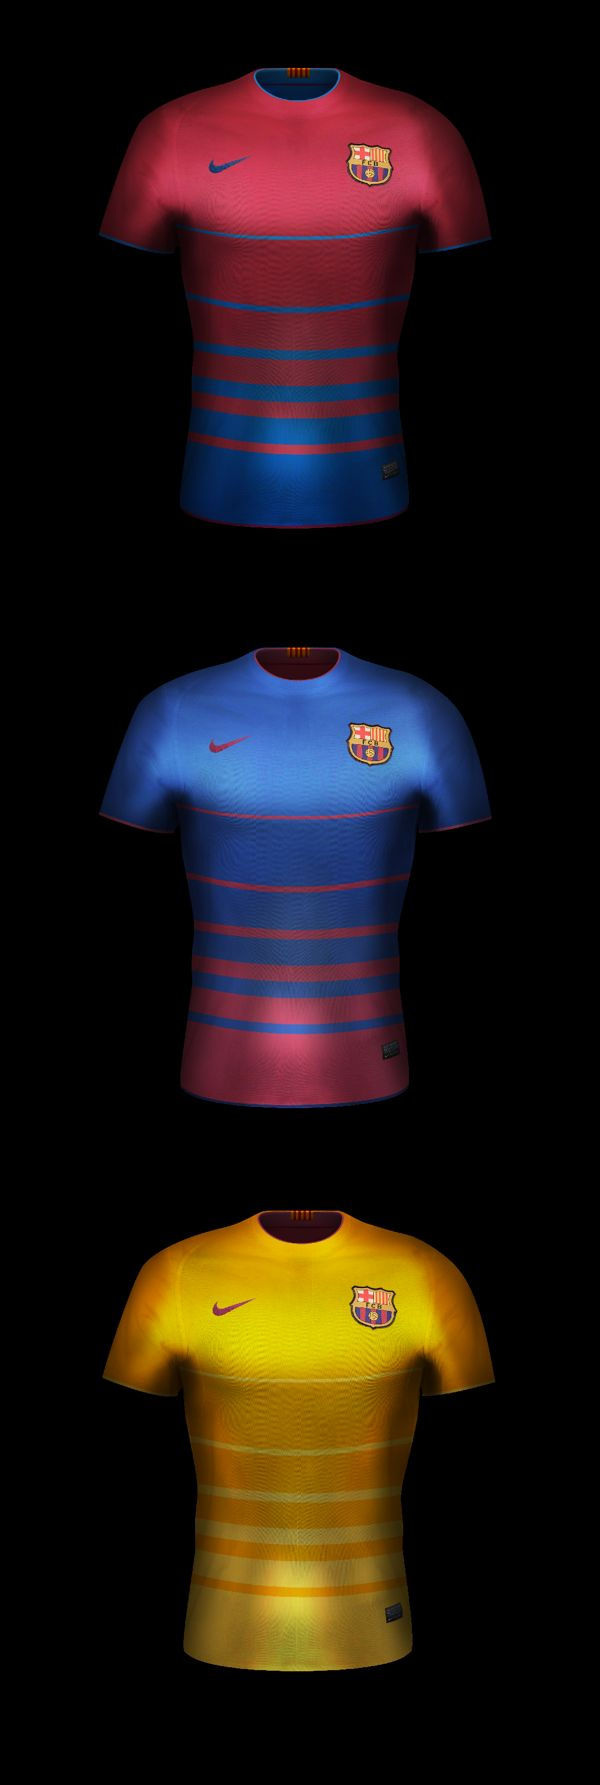 Barça Kit 2014-2015.